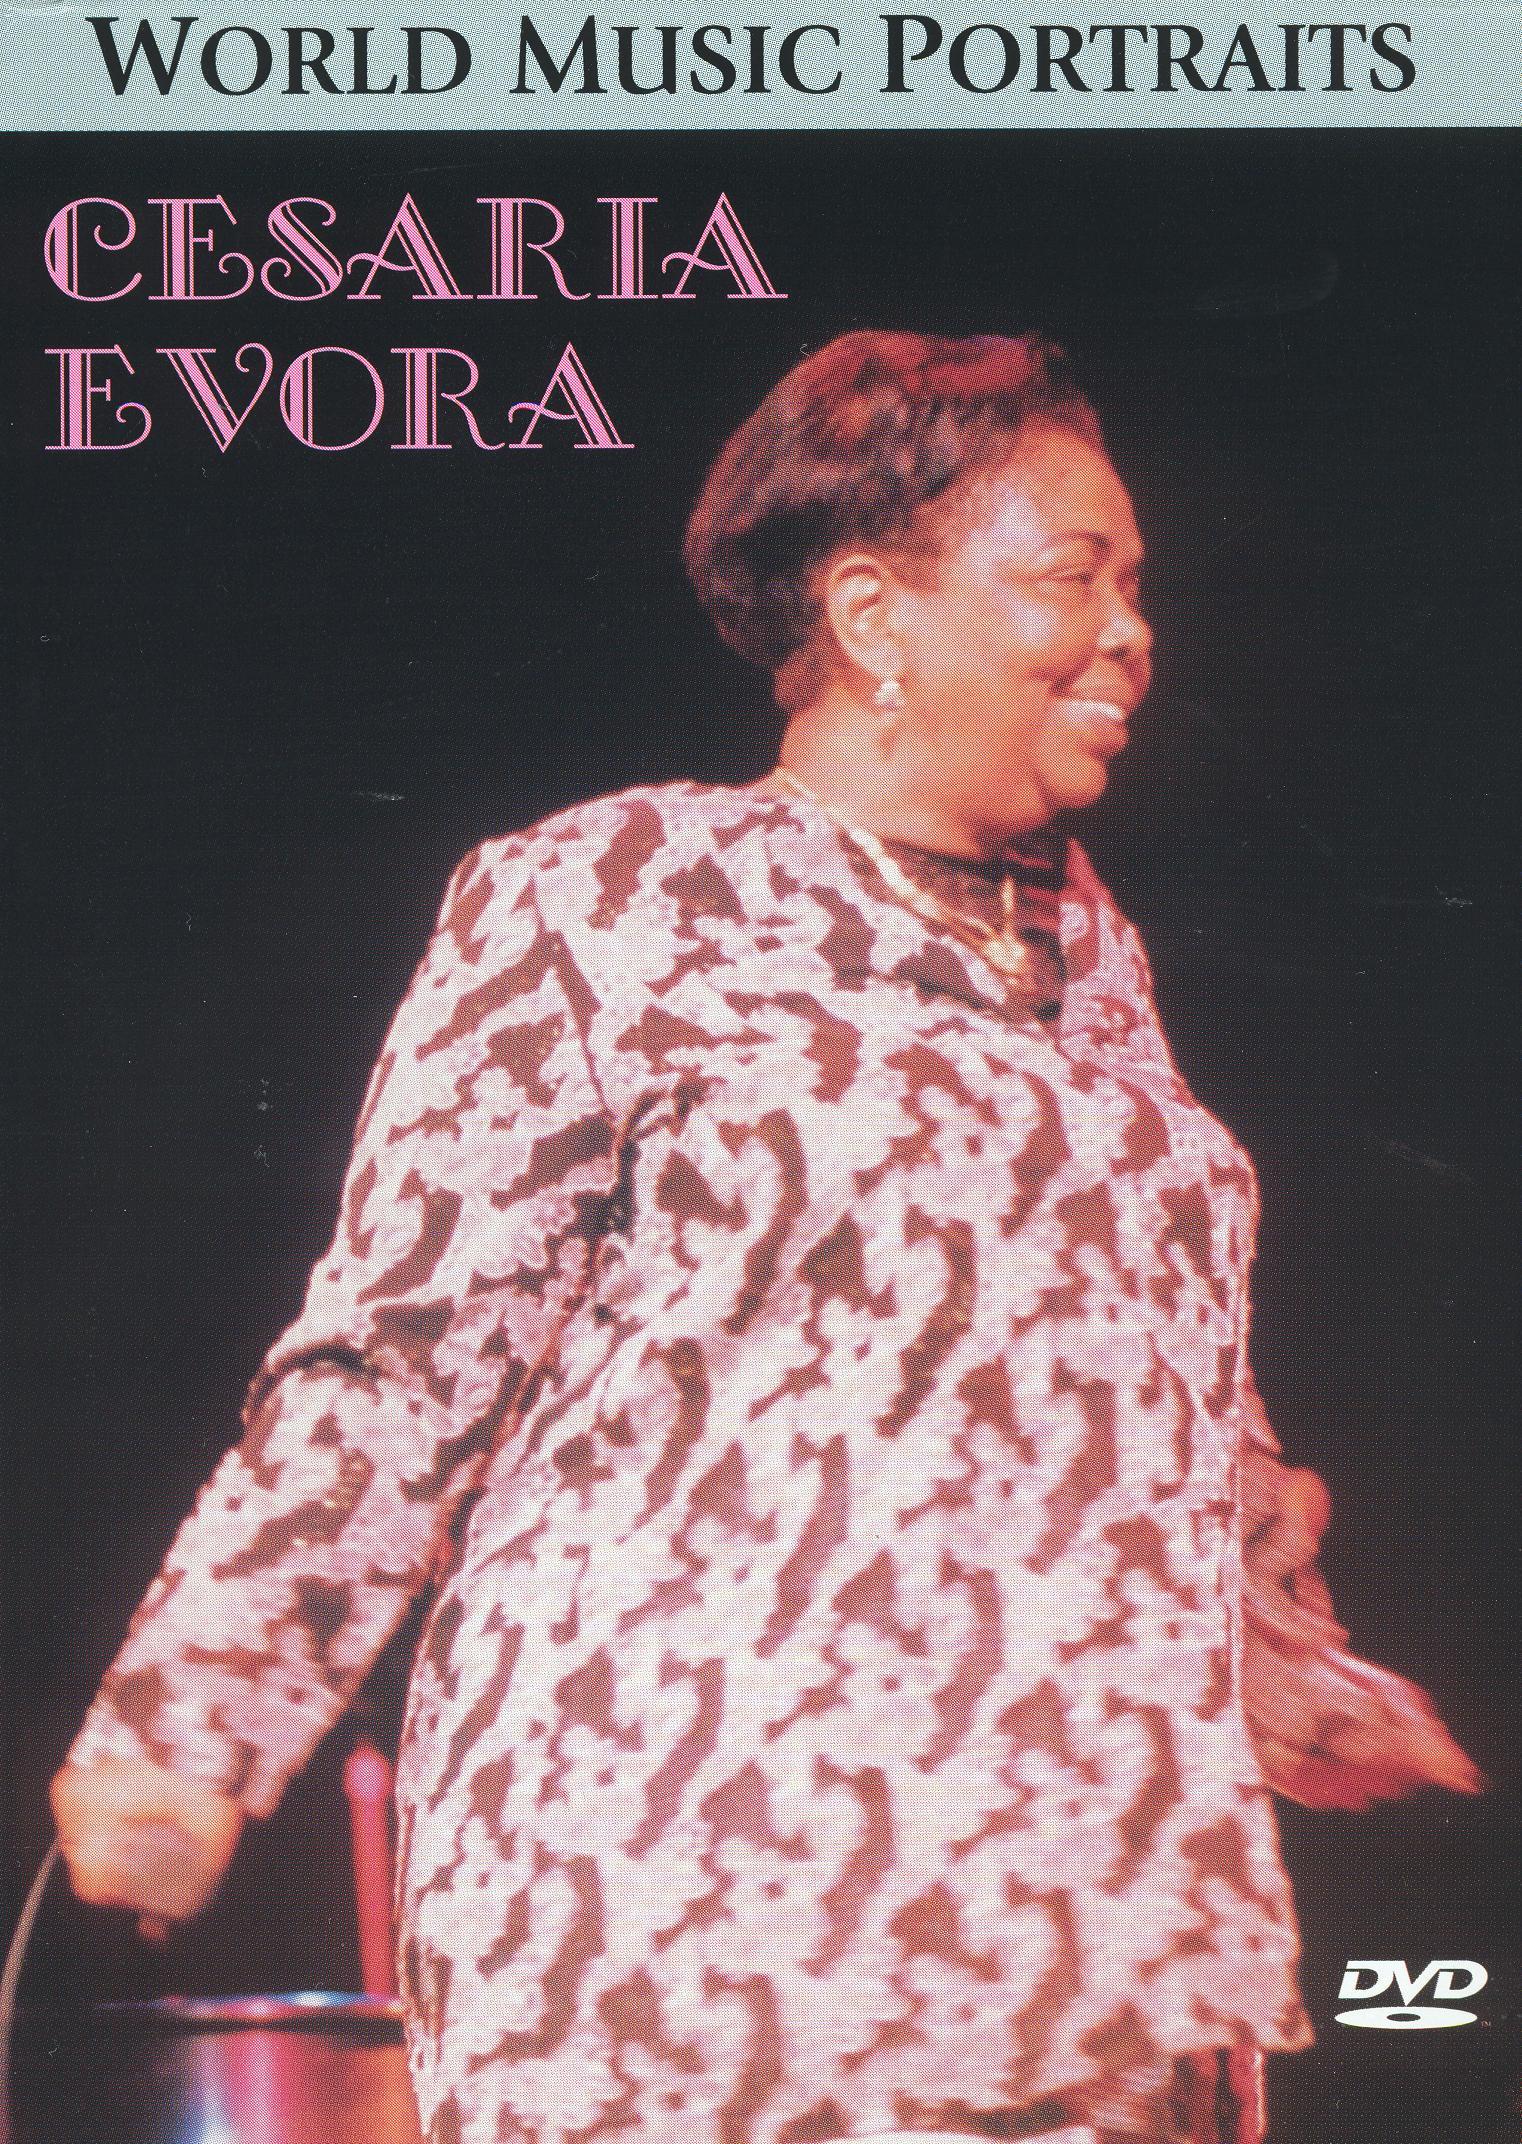 World Music Portraits: Cesaria Evora